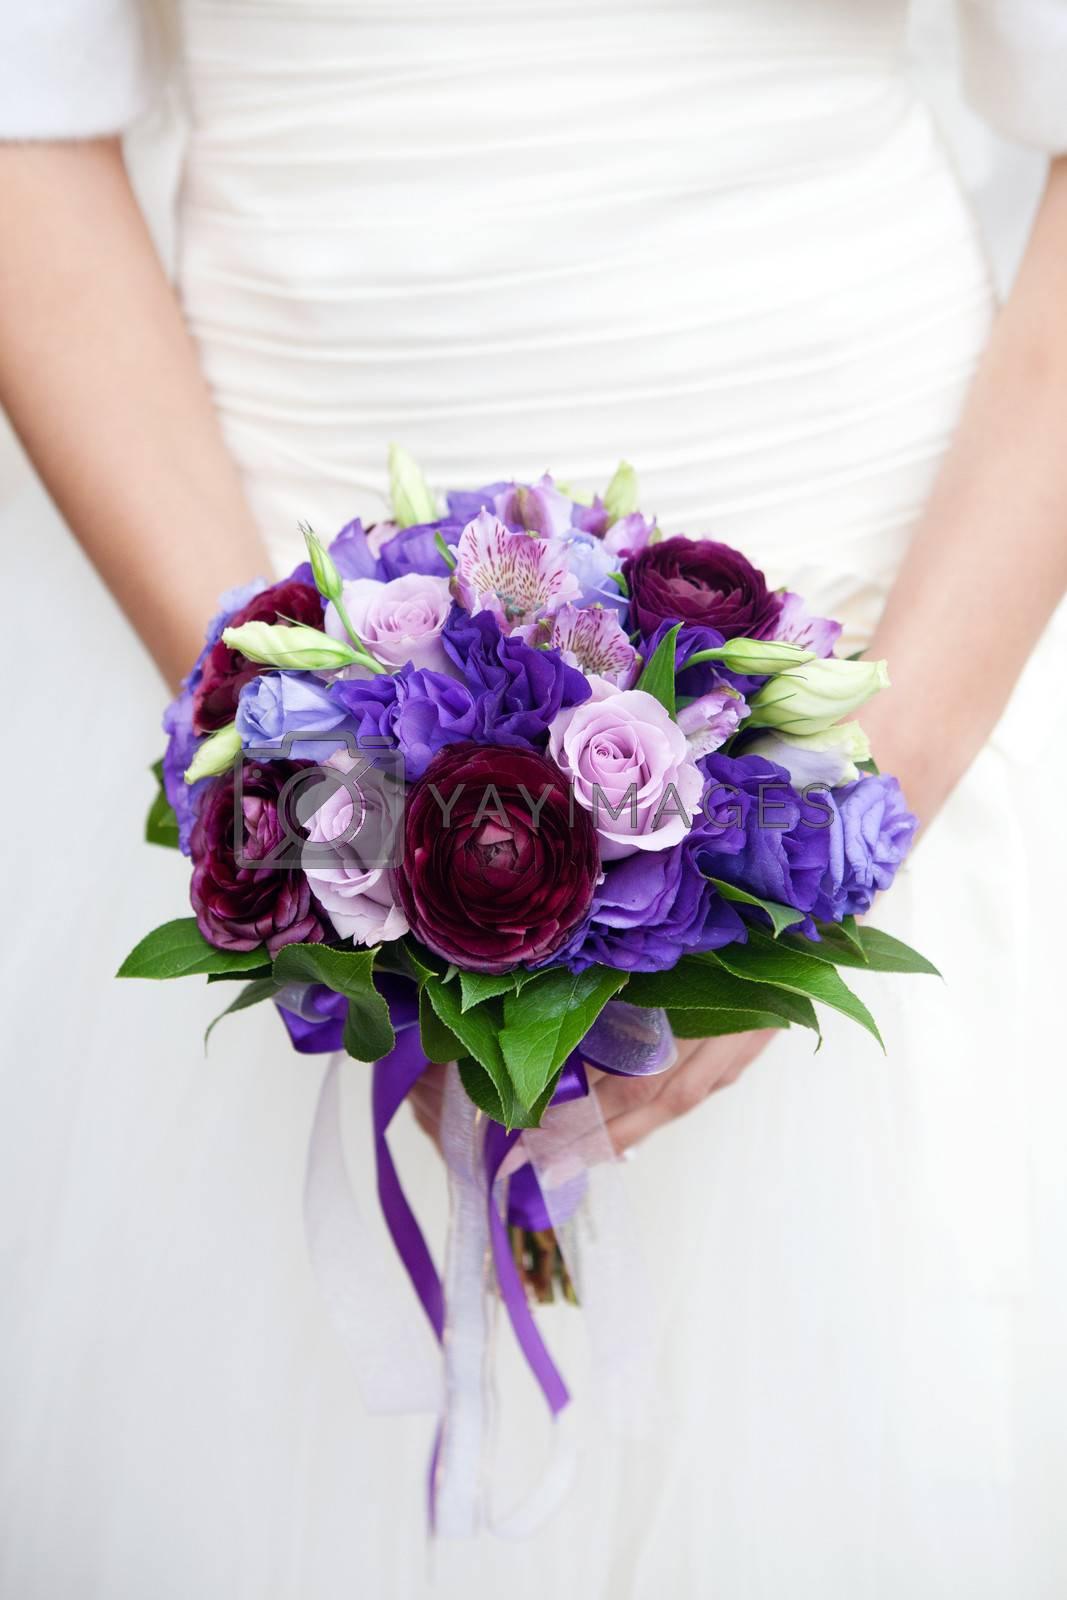 hands on wedding bouquet